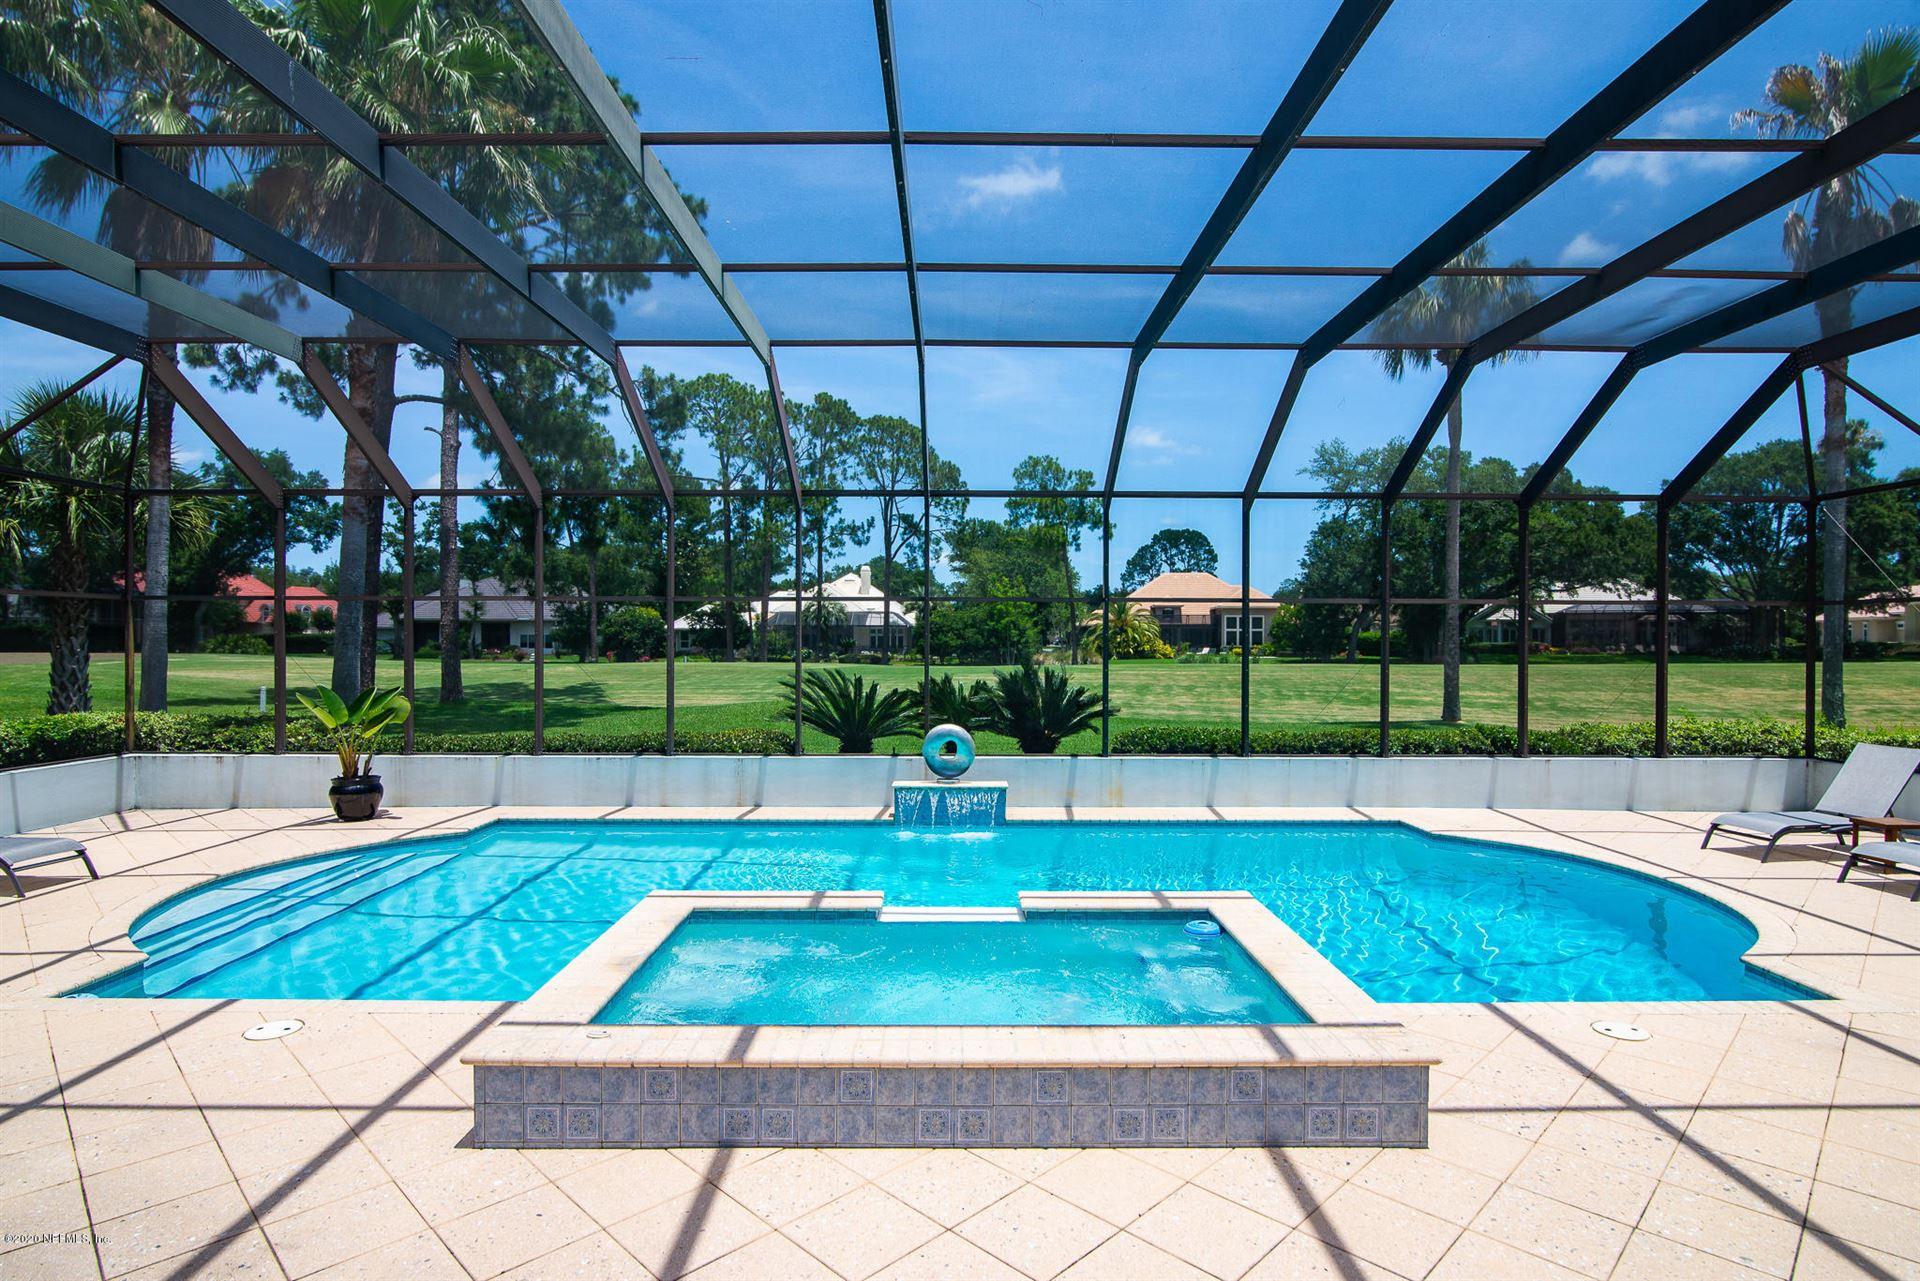 Photo for 100 SETTLERS ROW N, PONTE VEDRA BEACH, FL 32082 (MLS # 1056938)